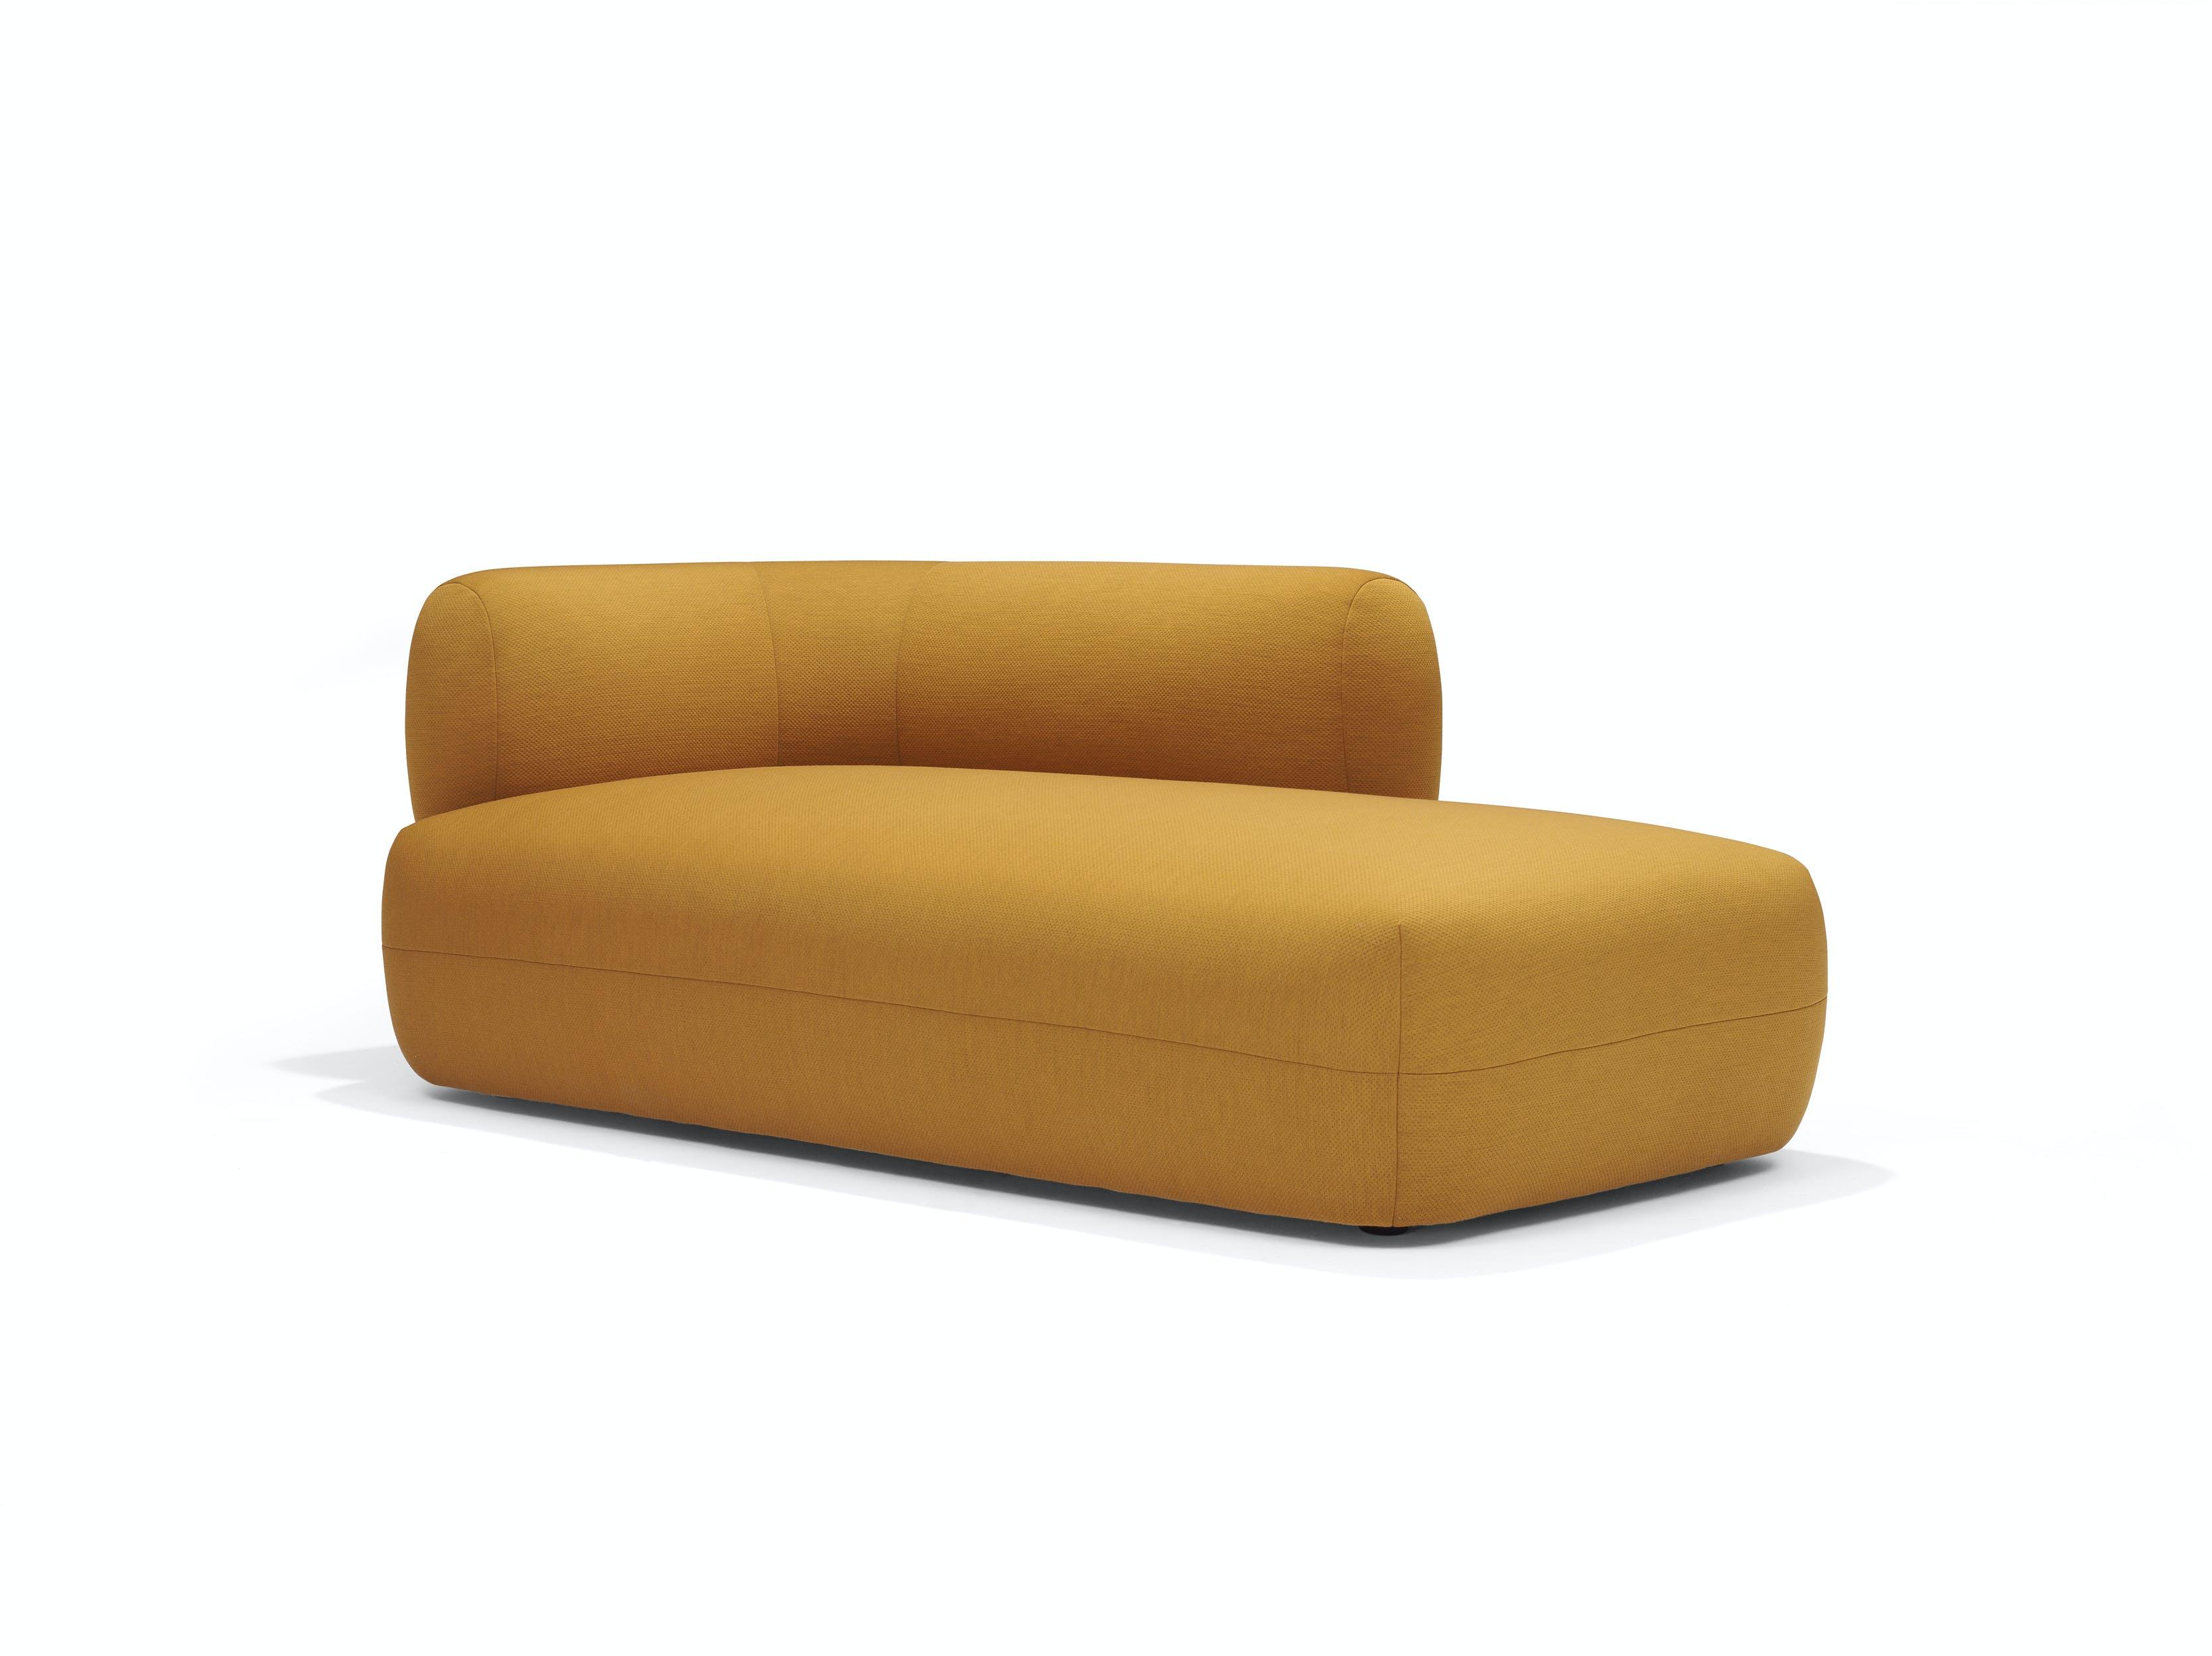 Linteloo-orange-arp-sofa-haute-living